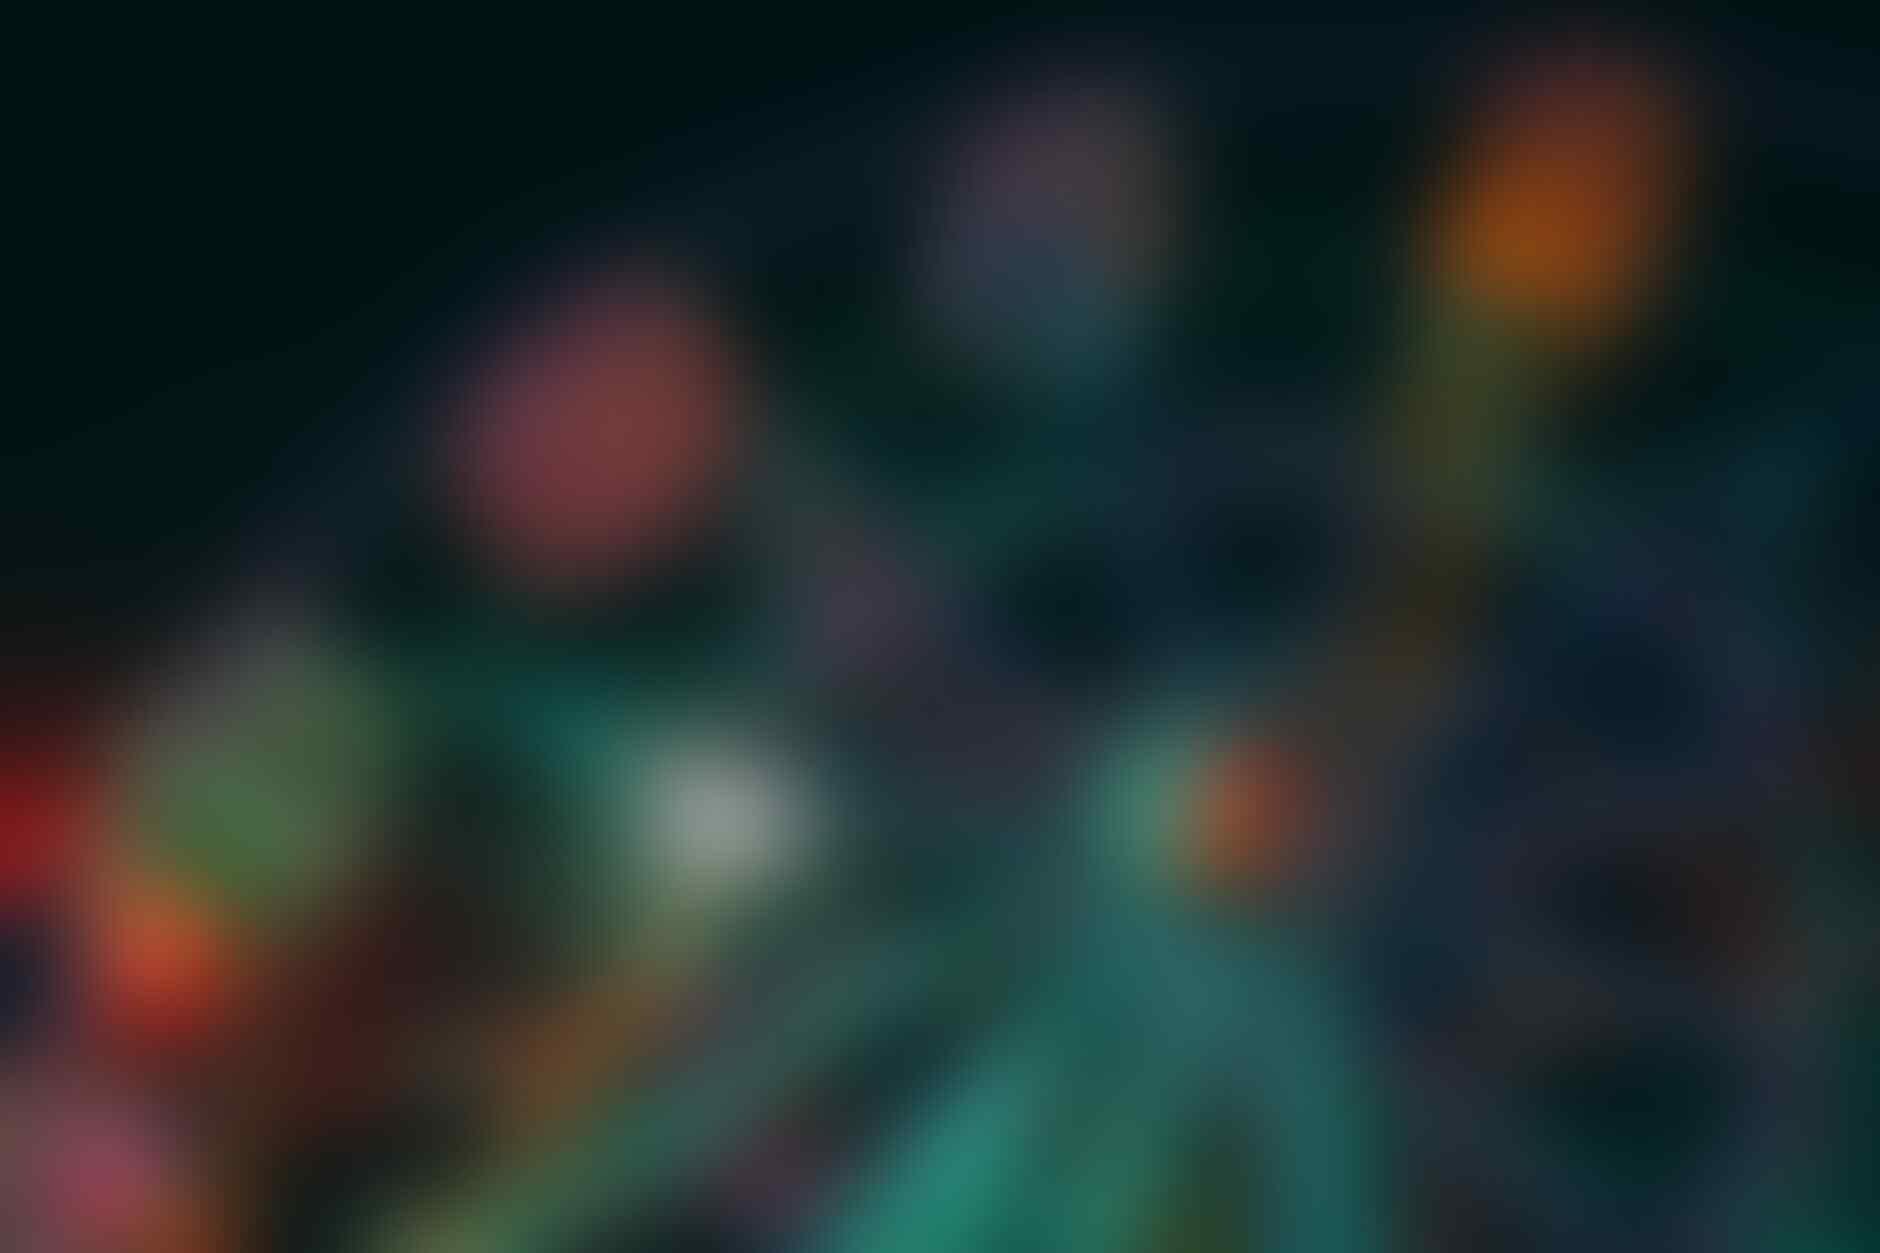 [CERPEN] Kata-Kata dalam Kabin Bianglala